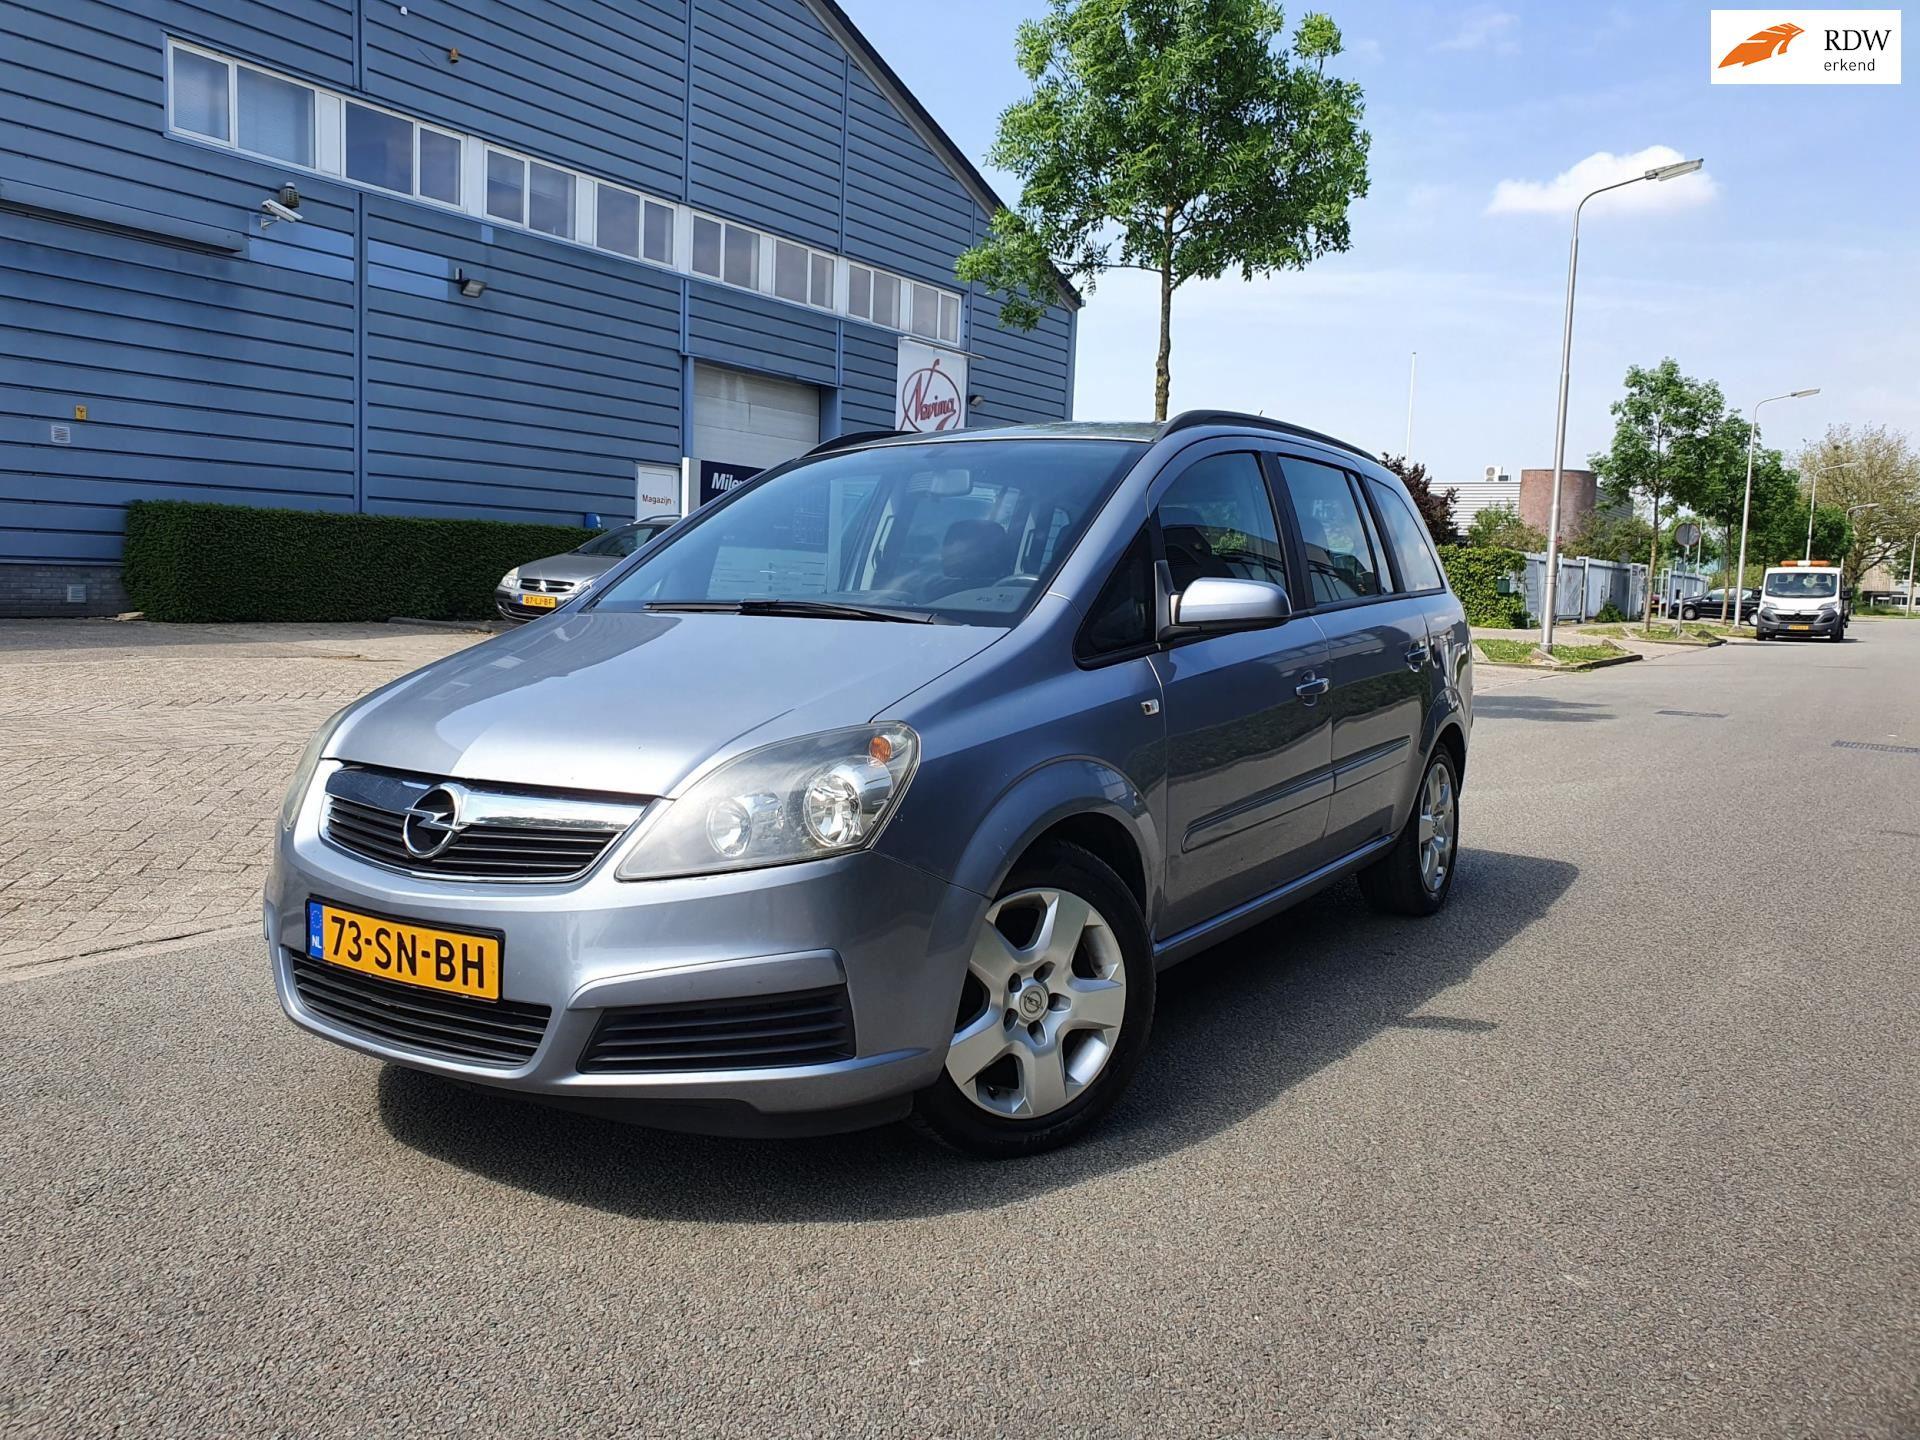 Opel Zafira occasion - Autohandel Direct